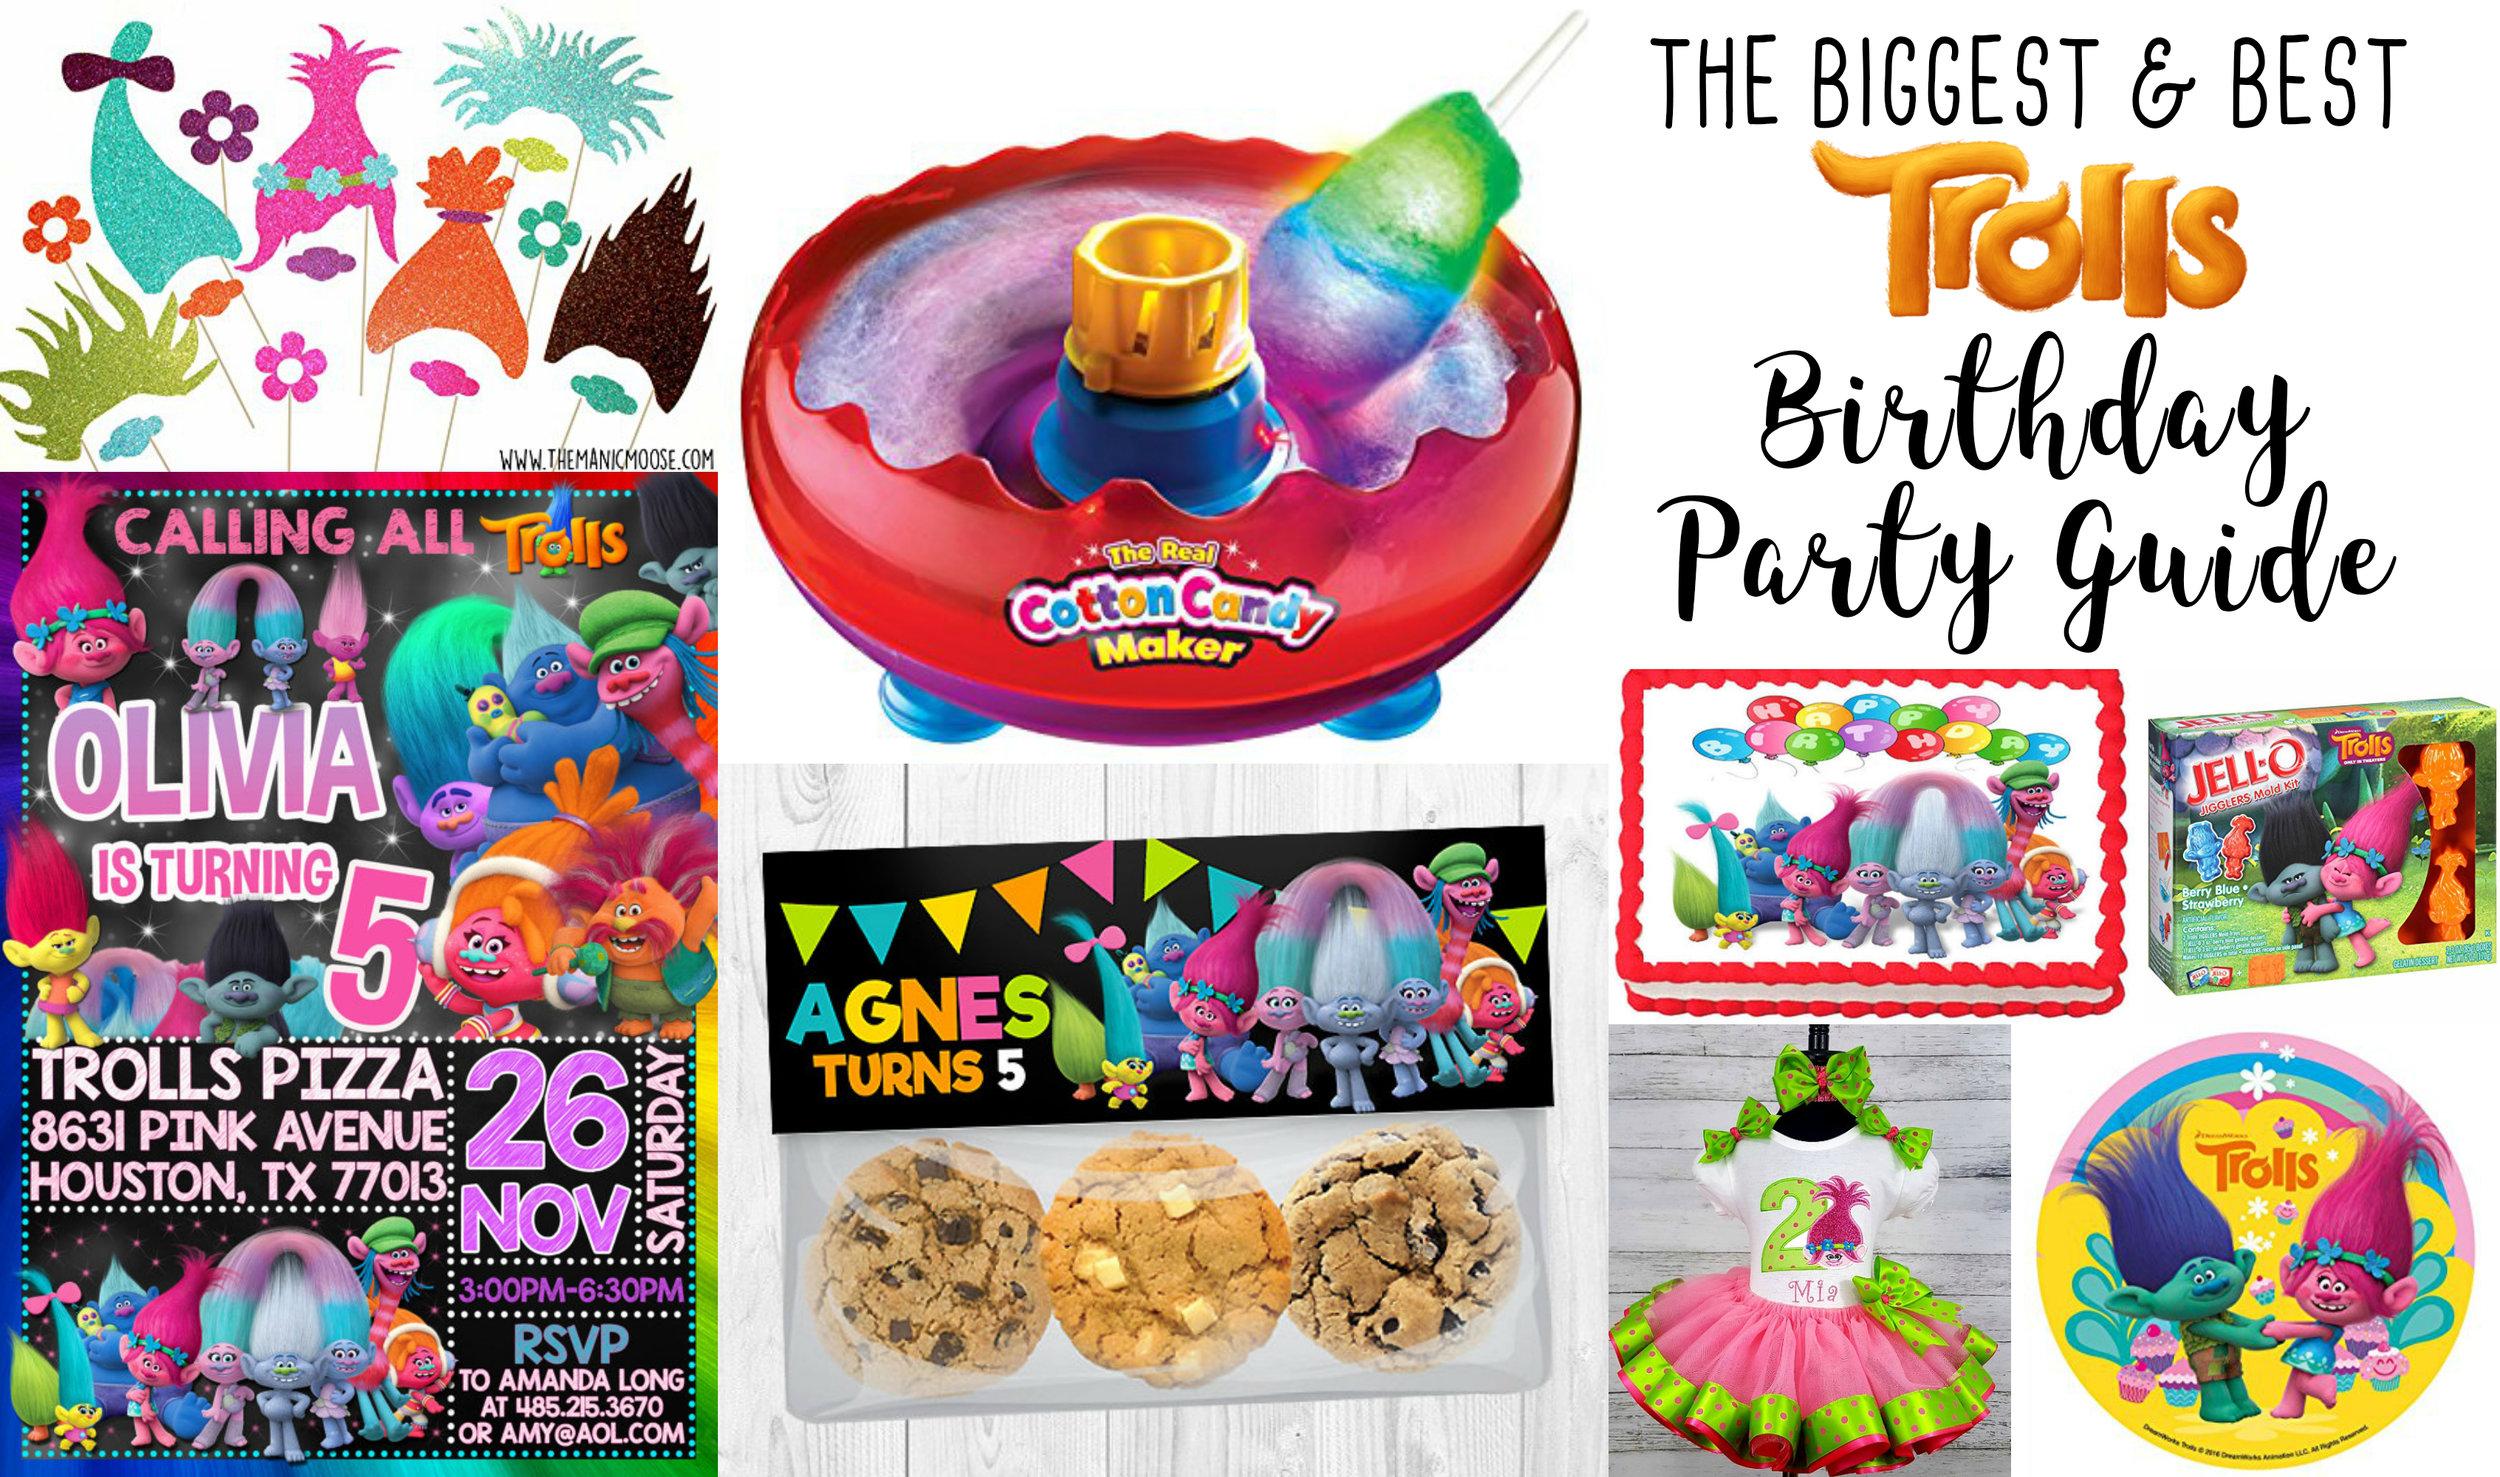 Trolls Birthday Party Guide